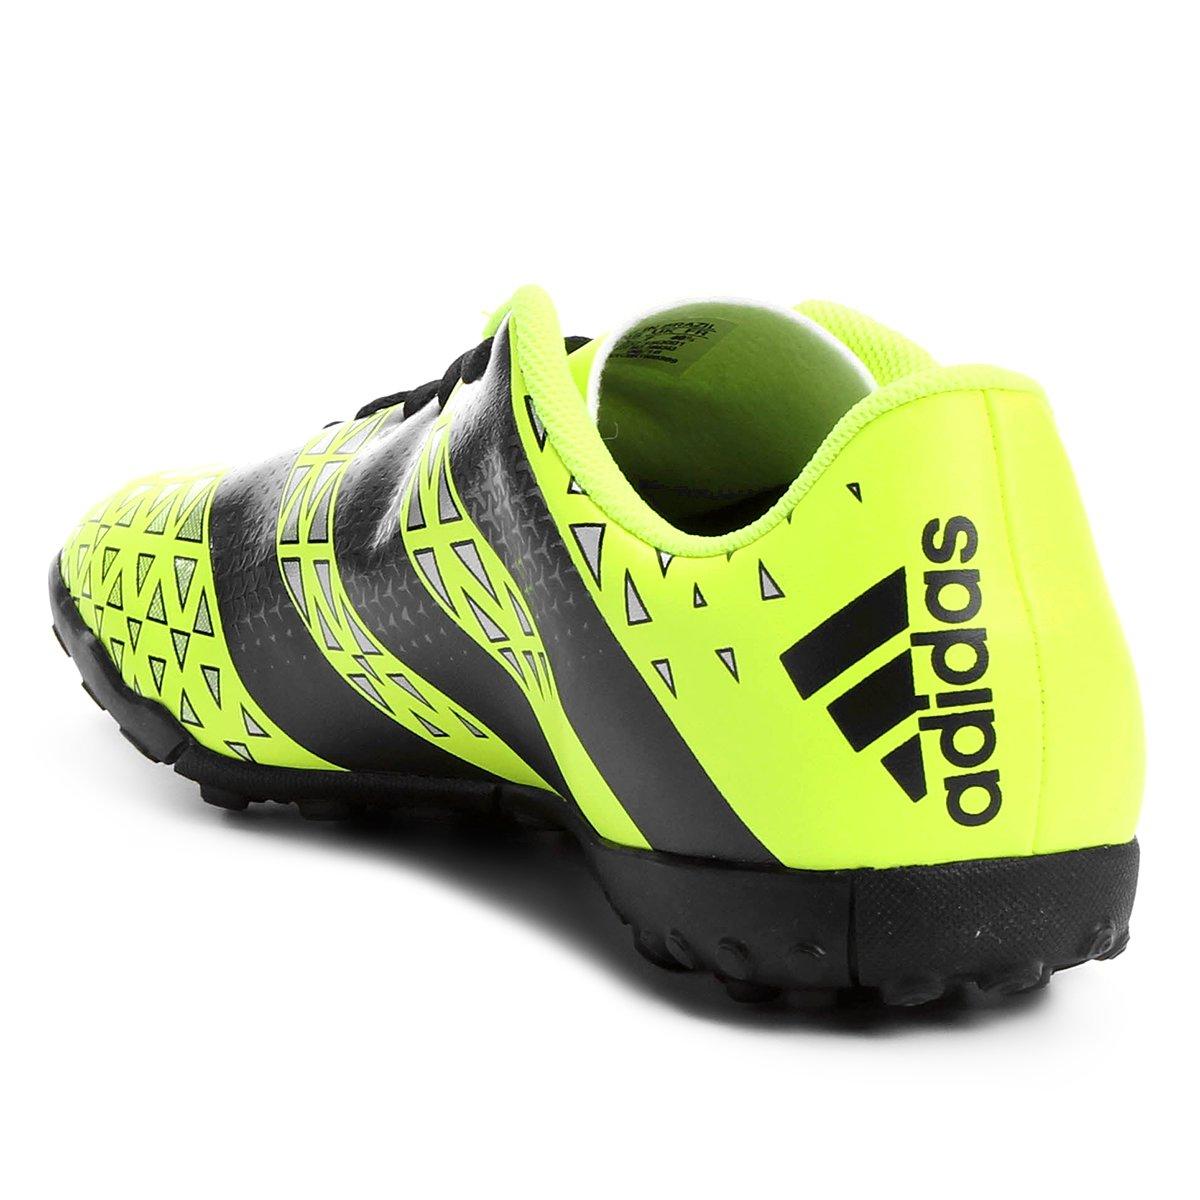 Chuteira Society Adidas Artilheira TF Masculina - Compre Agora ... 1eca050c3f3f8